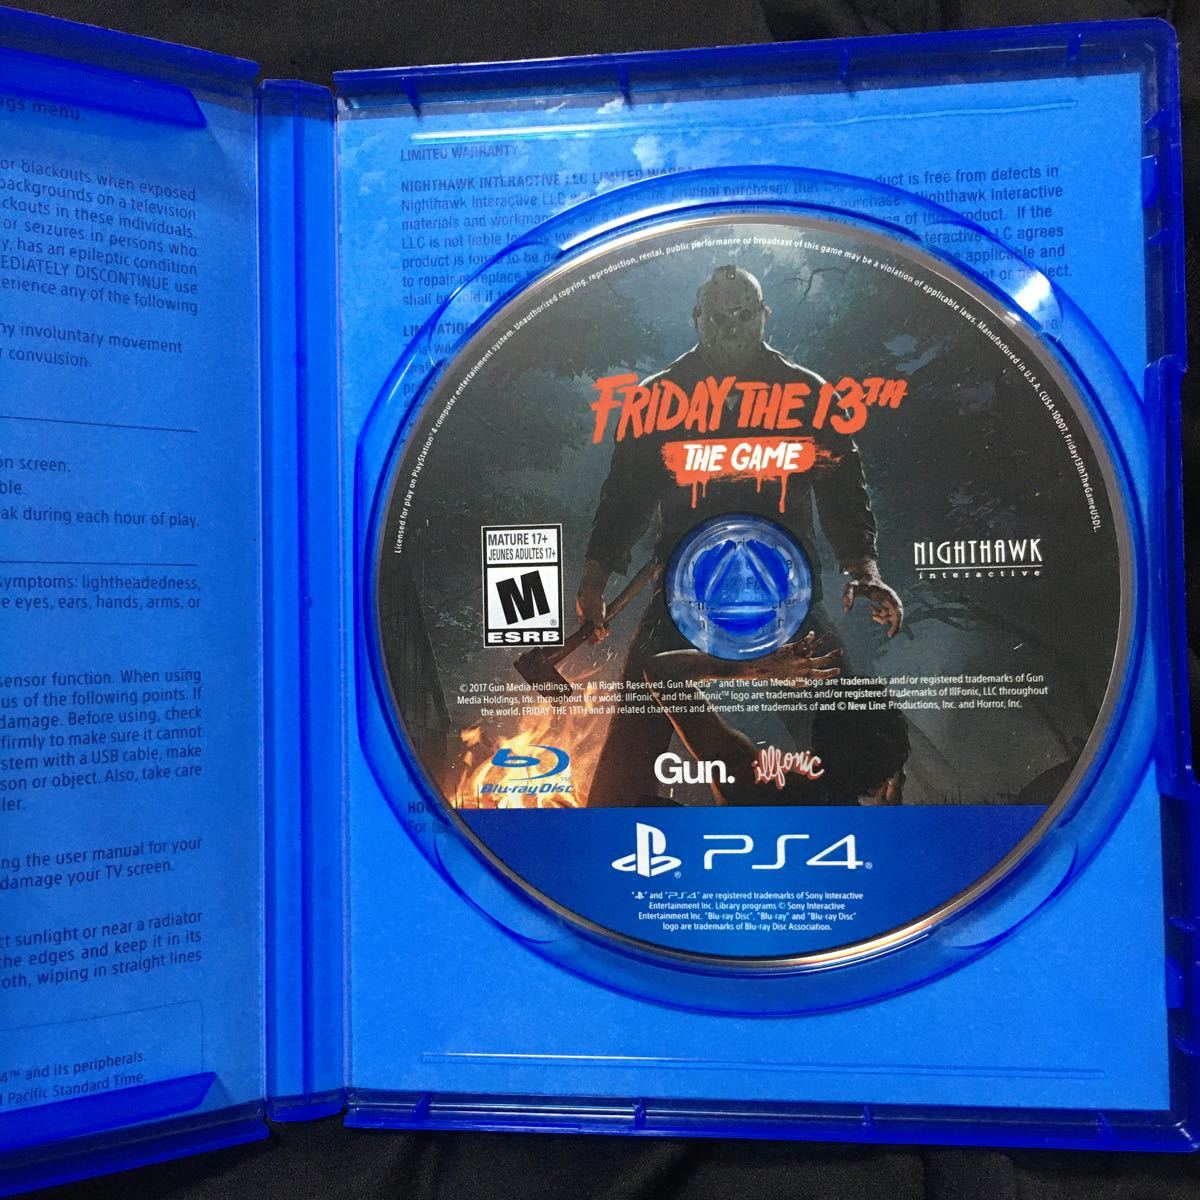 【PS4】 Friday The 13th The Game [輸入版:北米]送料無料、匿名配送、当日発送可能♪